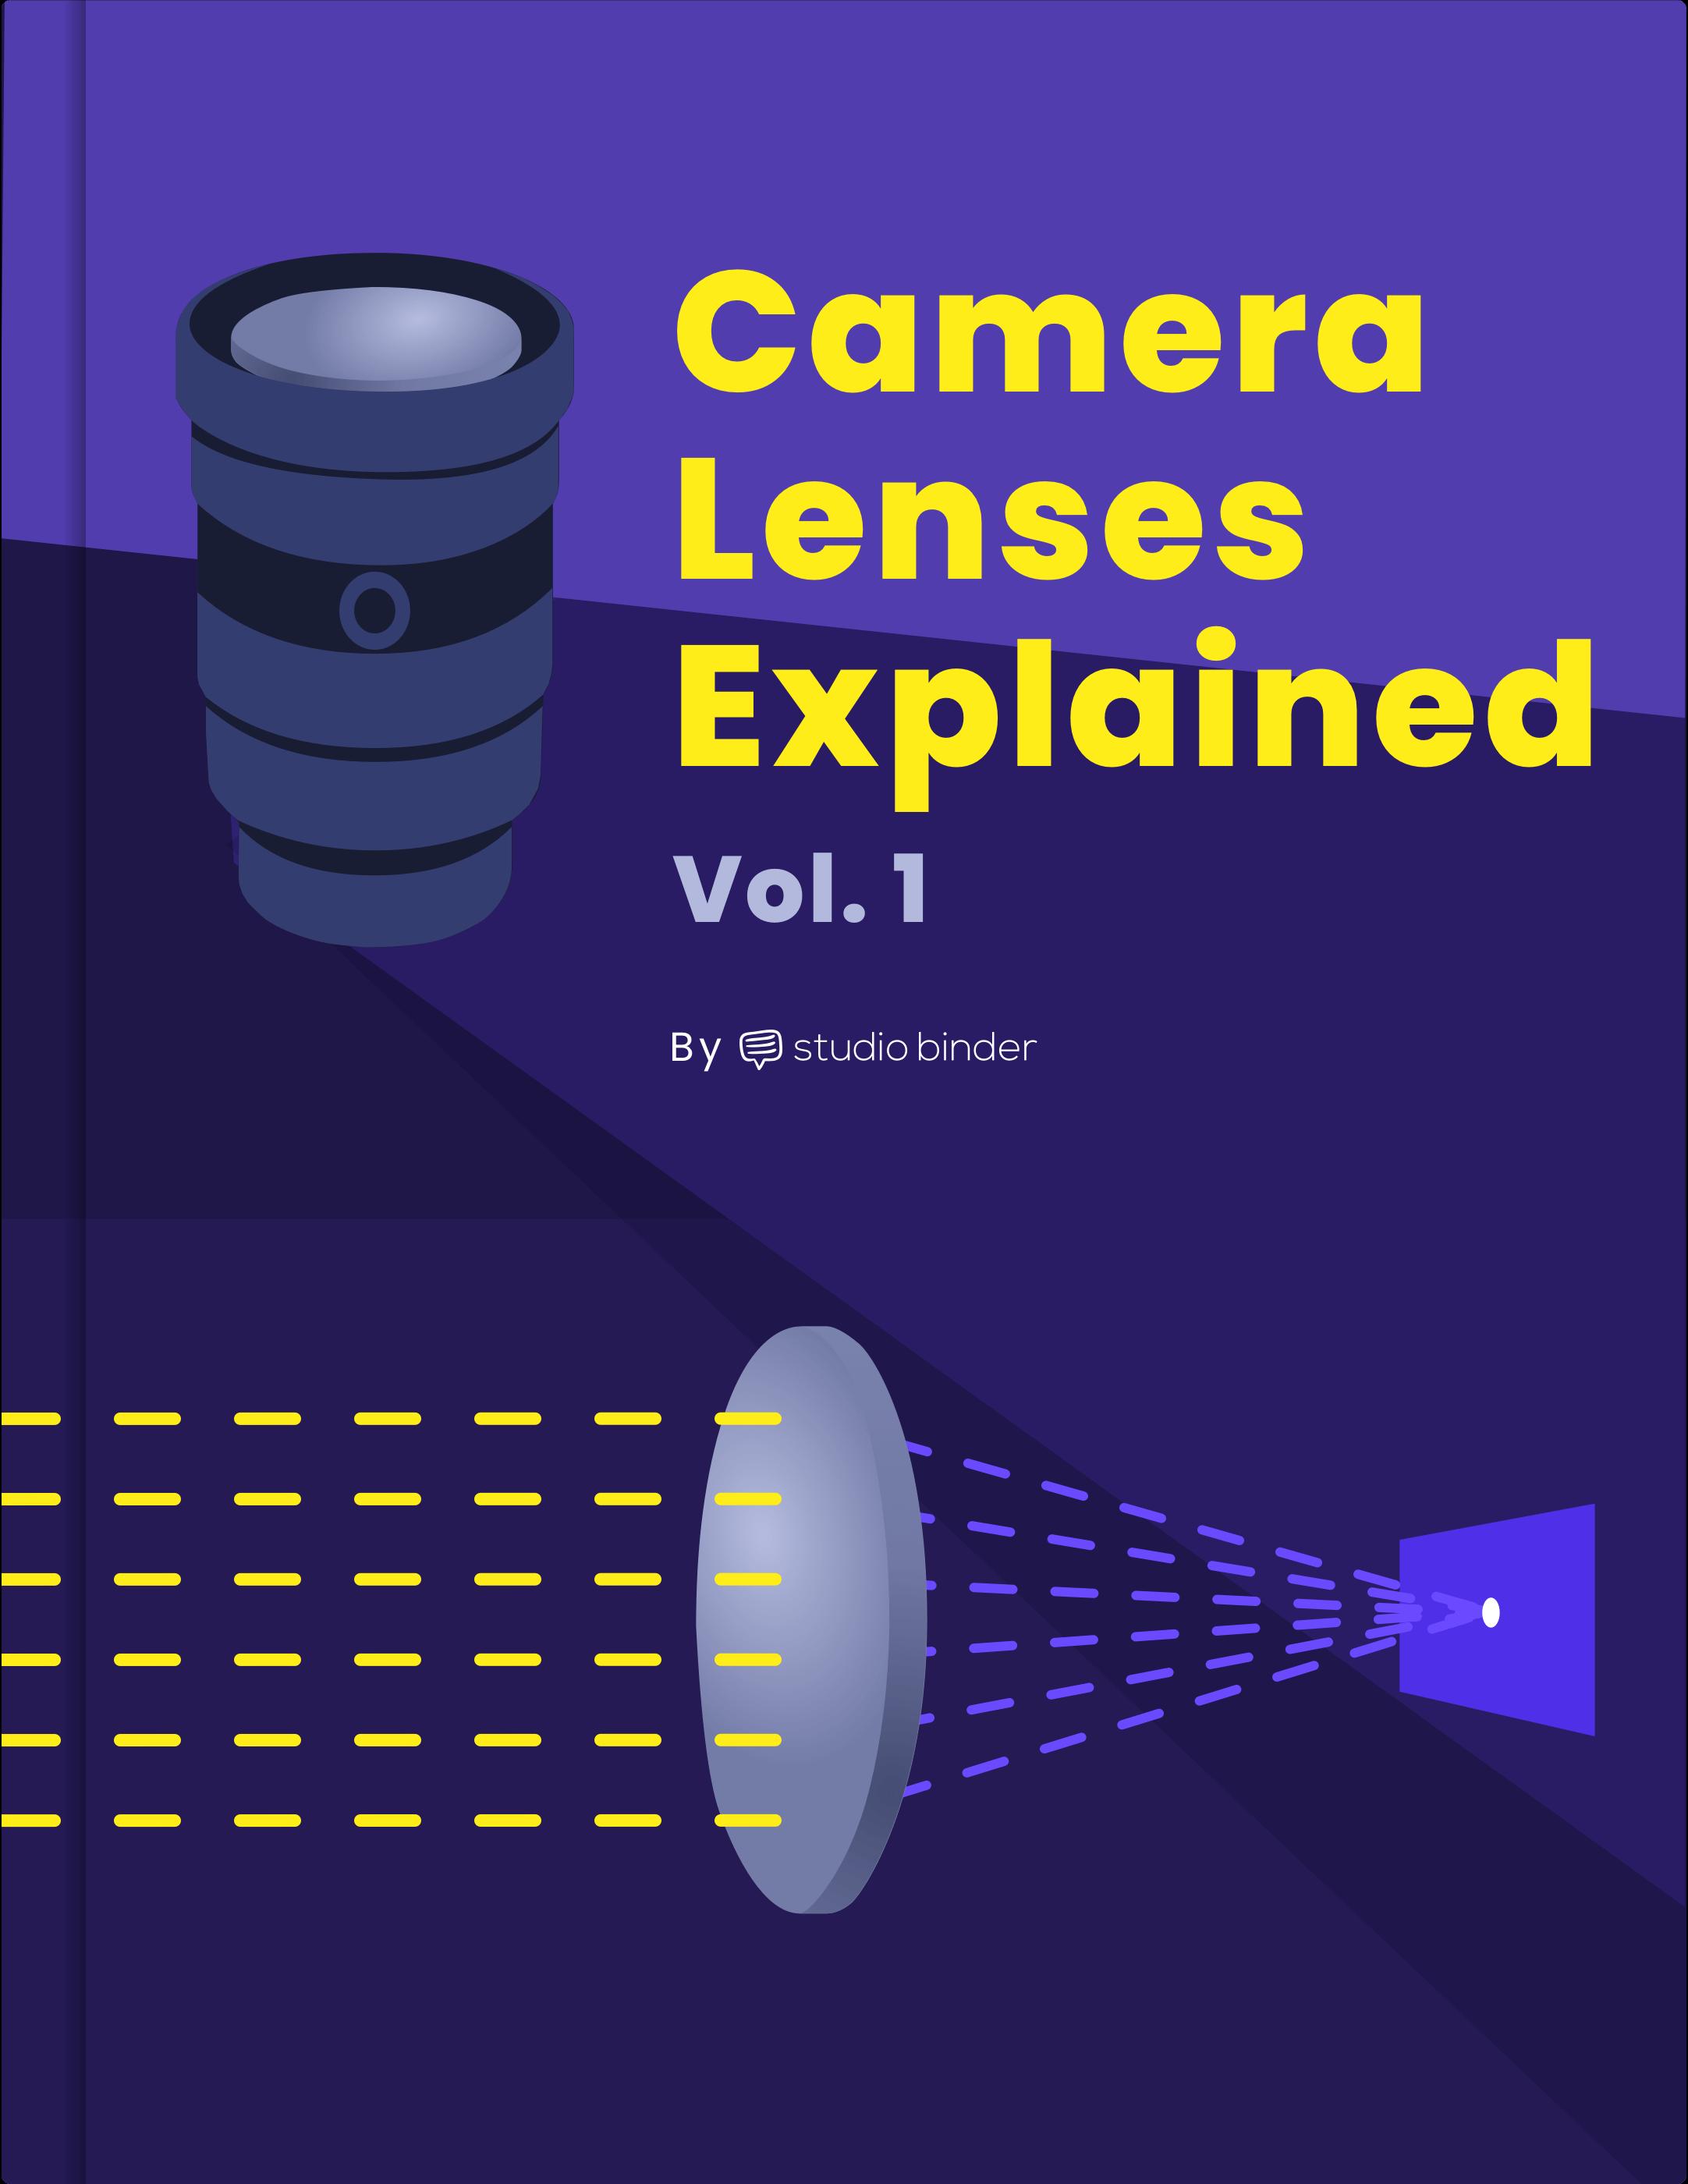 Camera Lenses Explained Ebook - Book Cover